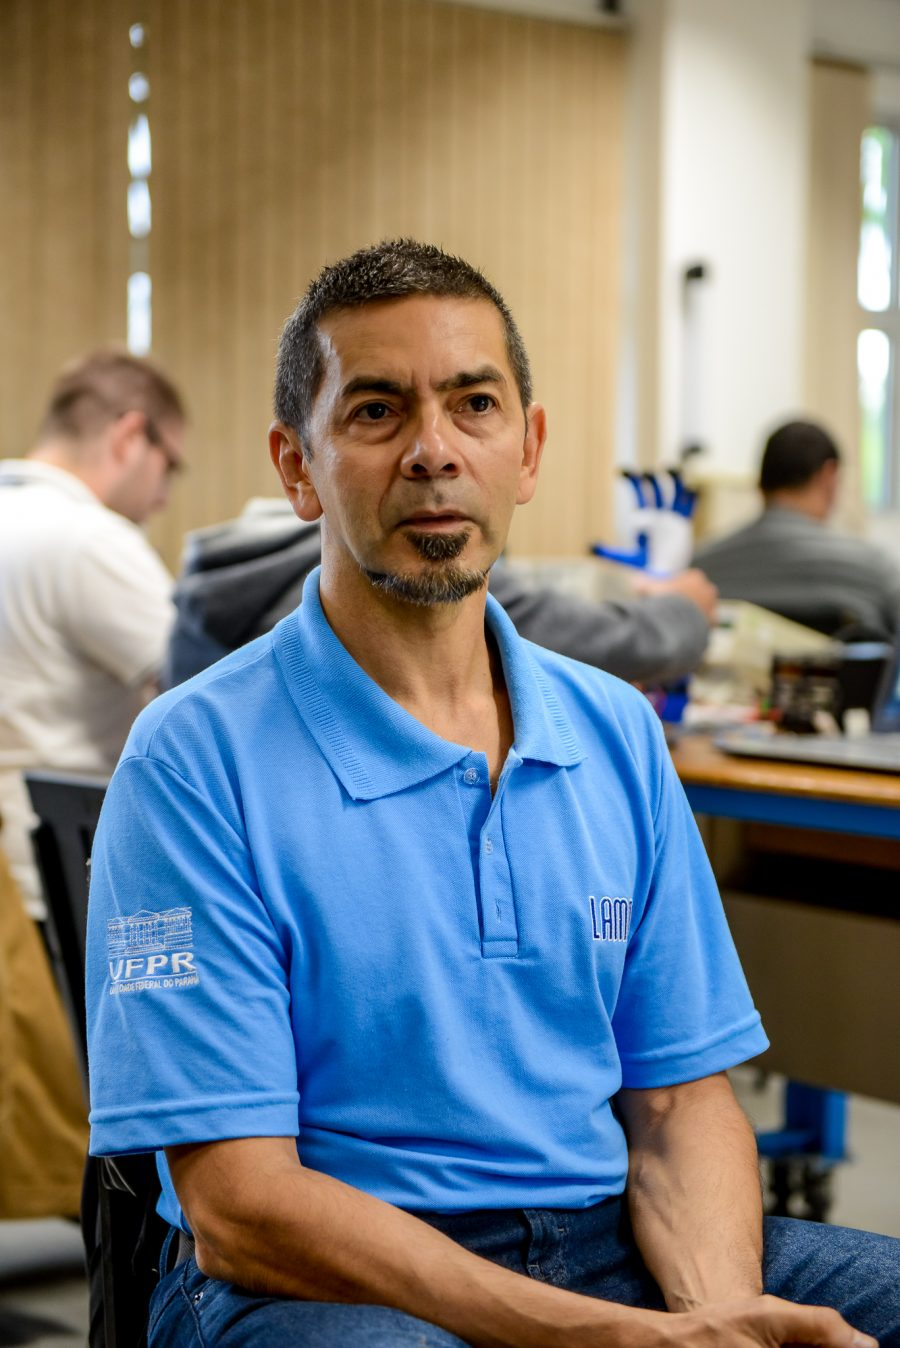 O professor Marlio Bonfim: busca de parcerias e financiamentos para projeto (Foto: Marcos Solevan/UFPR)